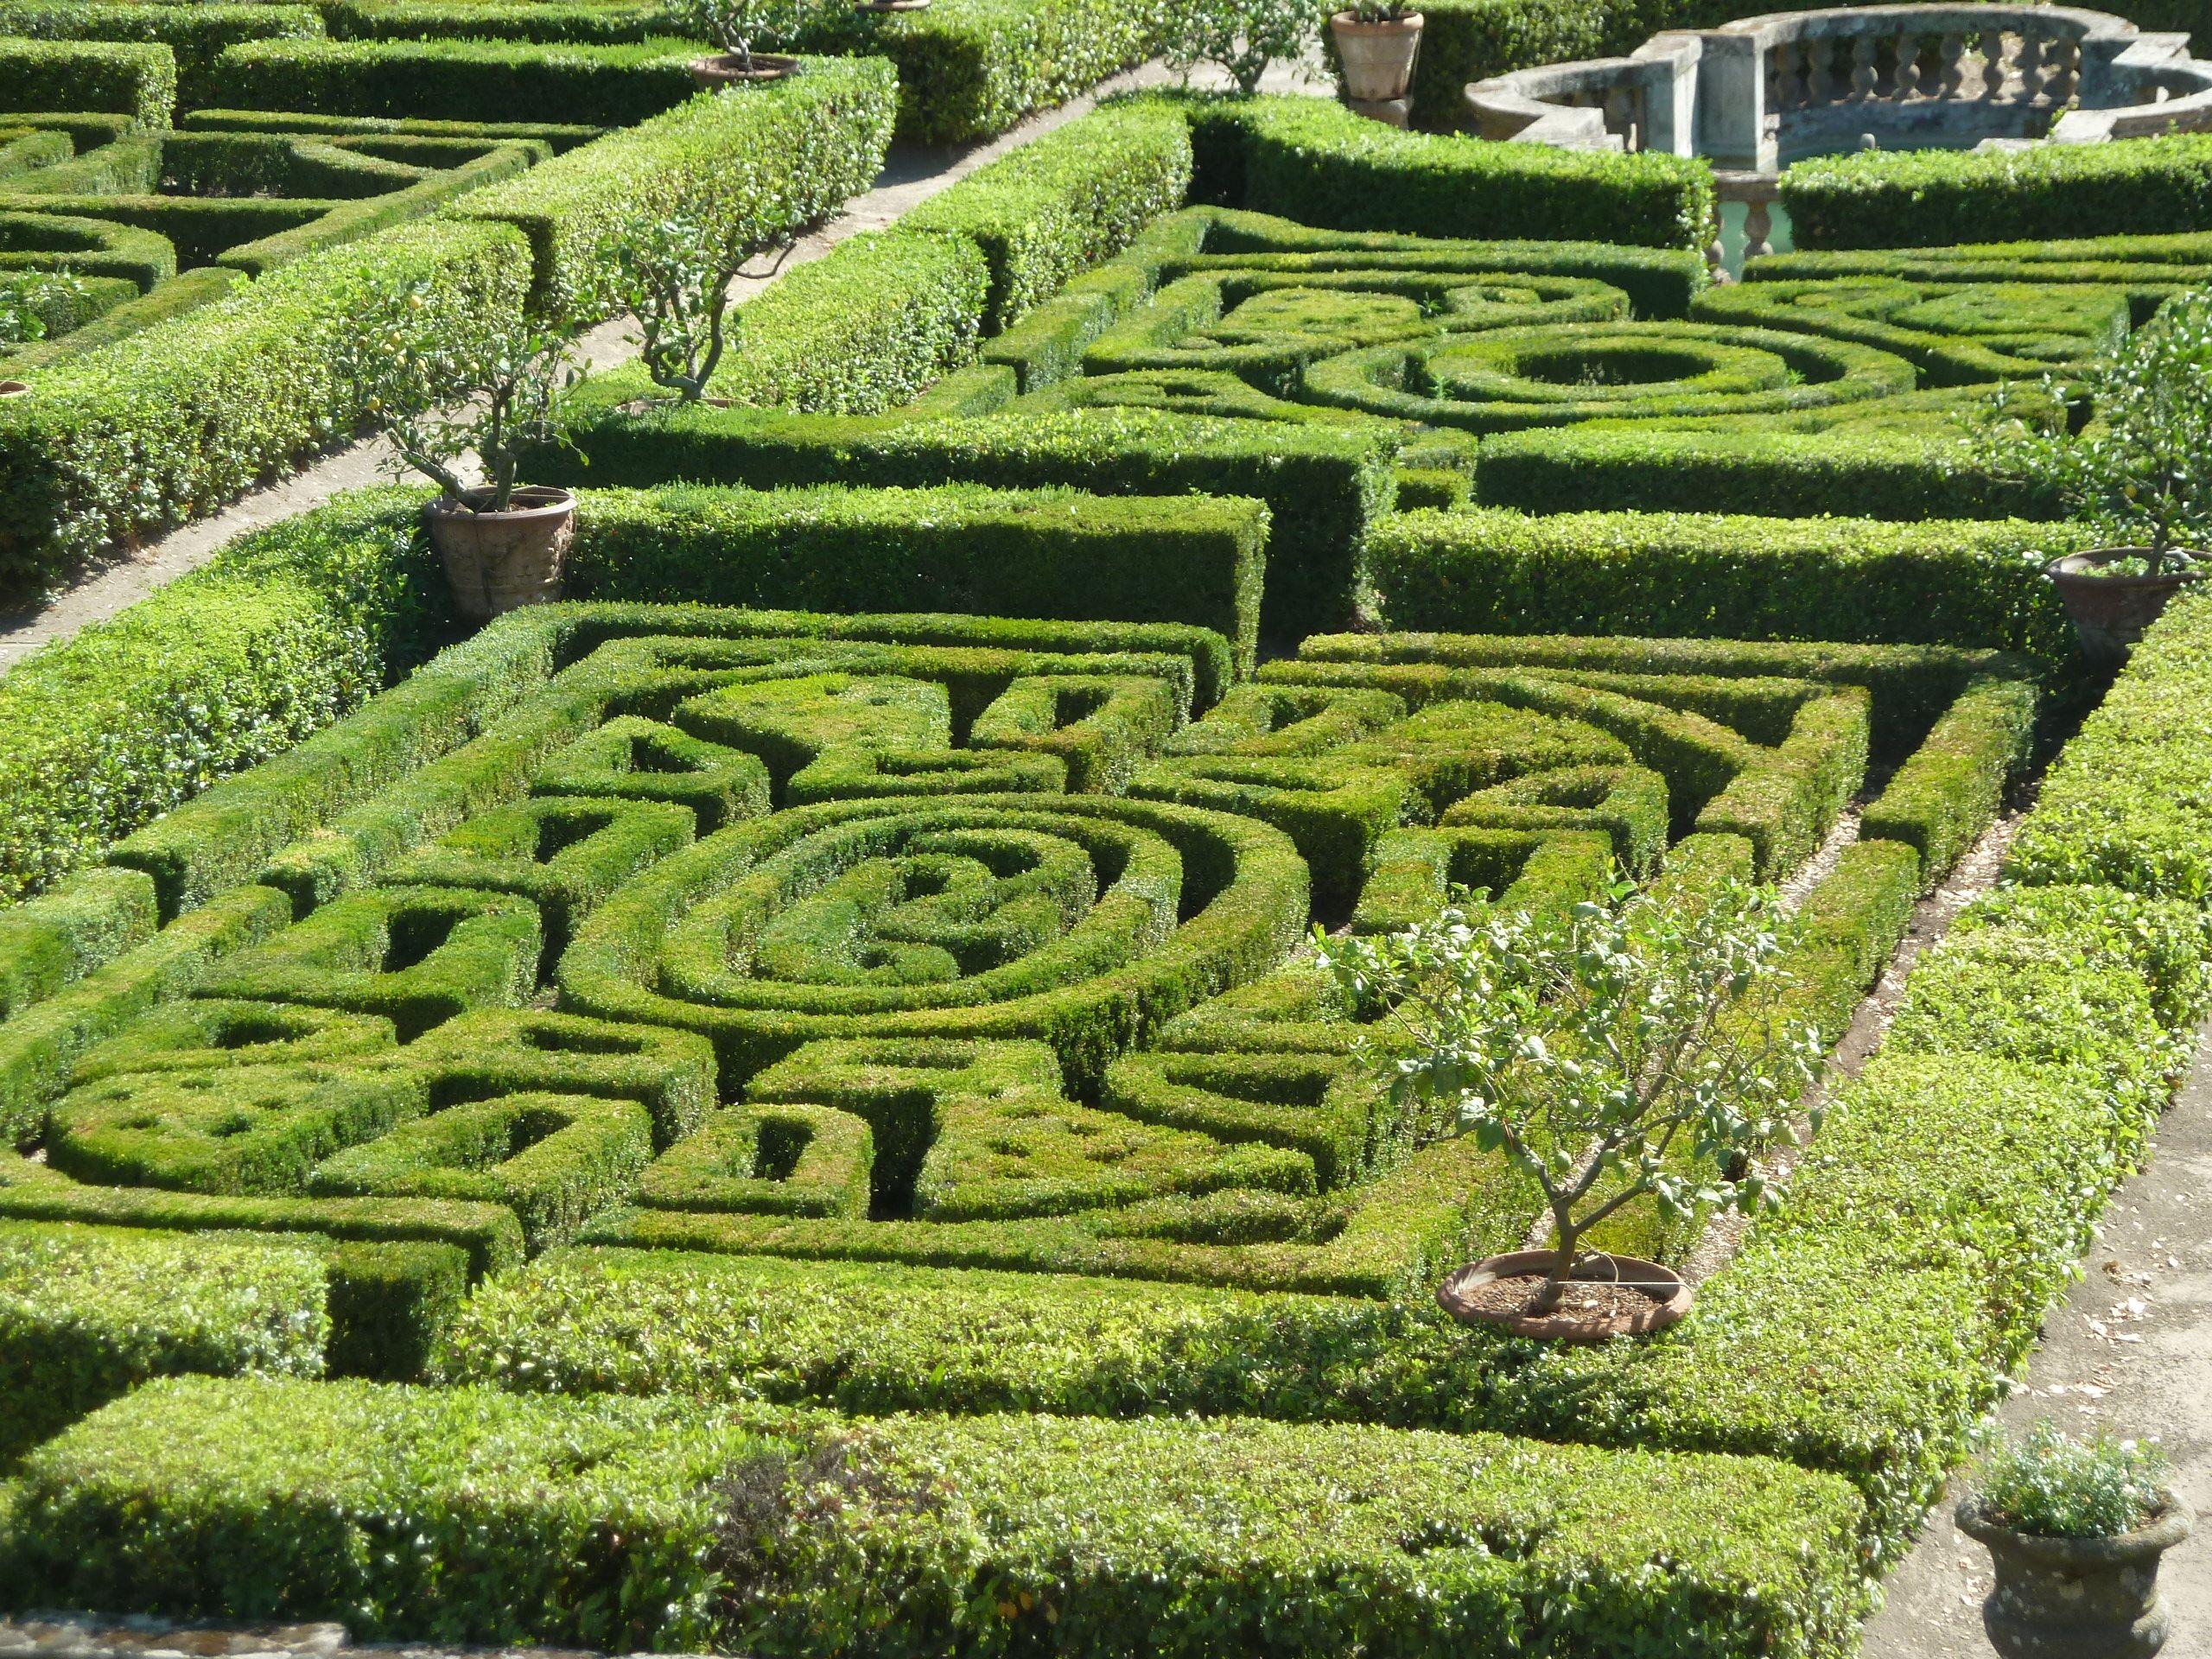 labyrinthe on Pinterest Labyrinths, Maze and Hedges